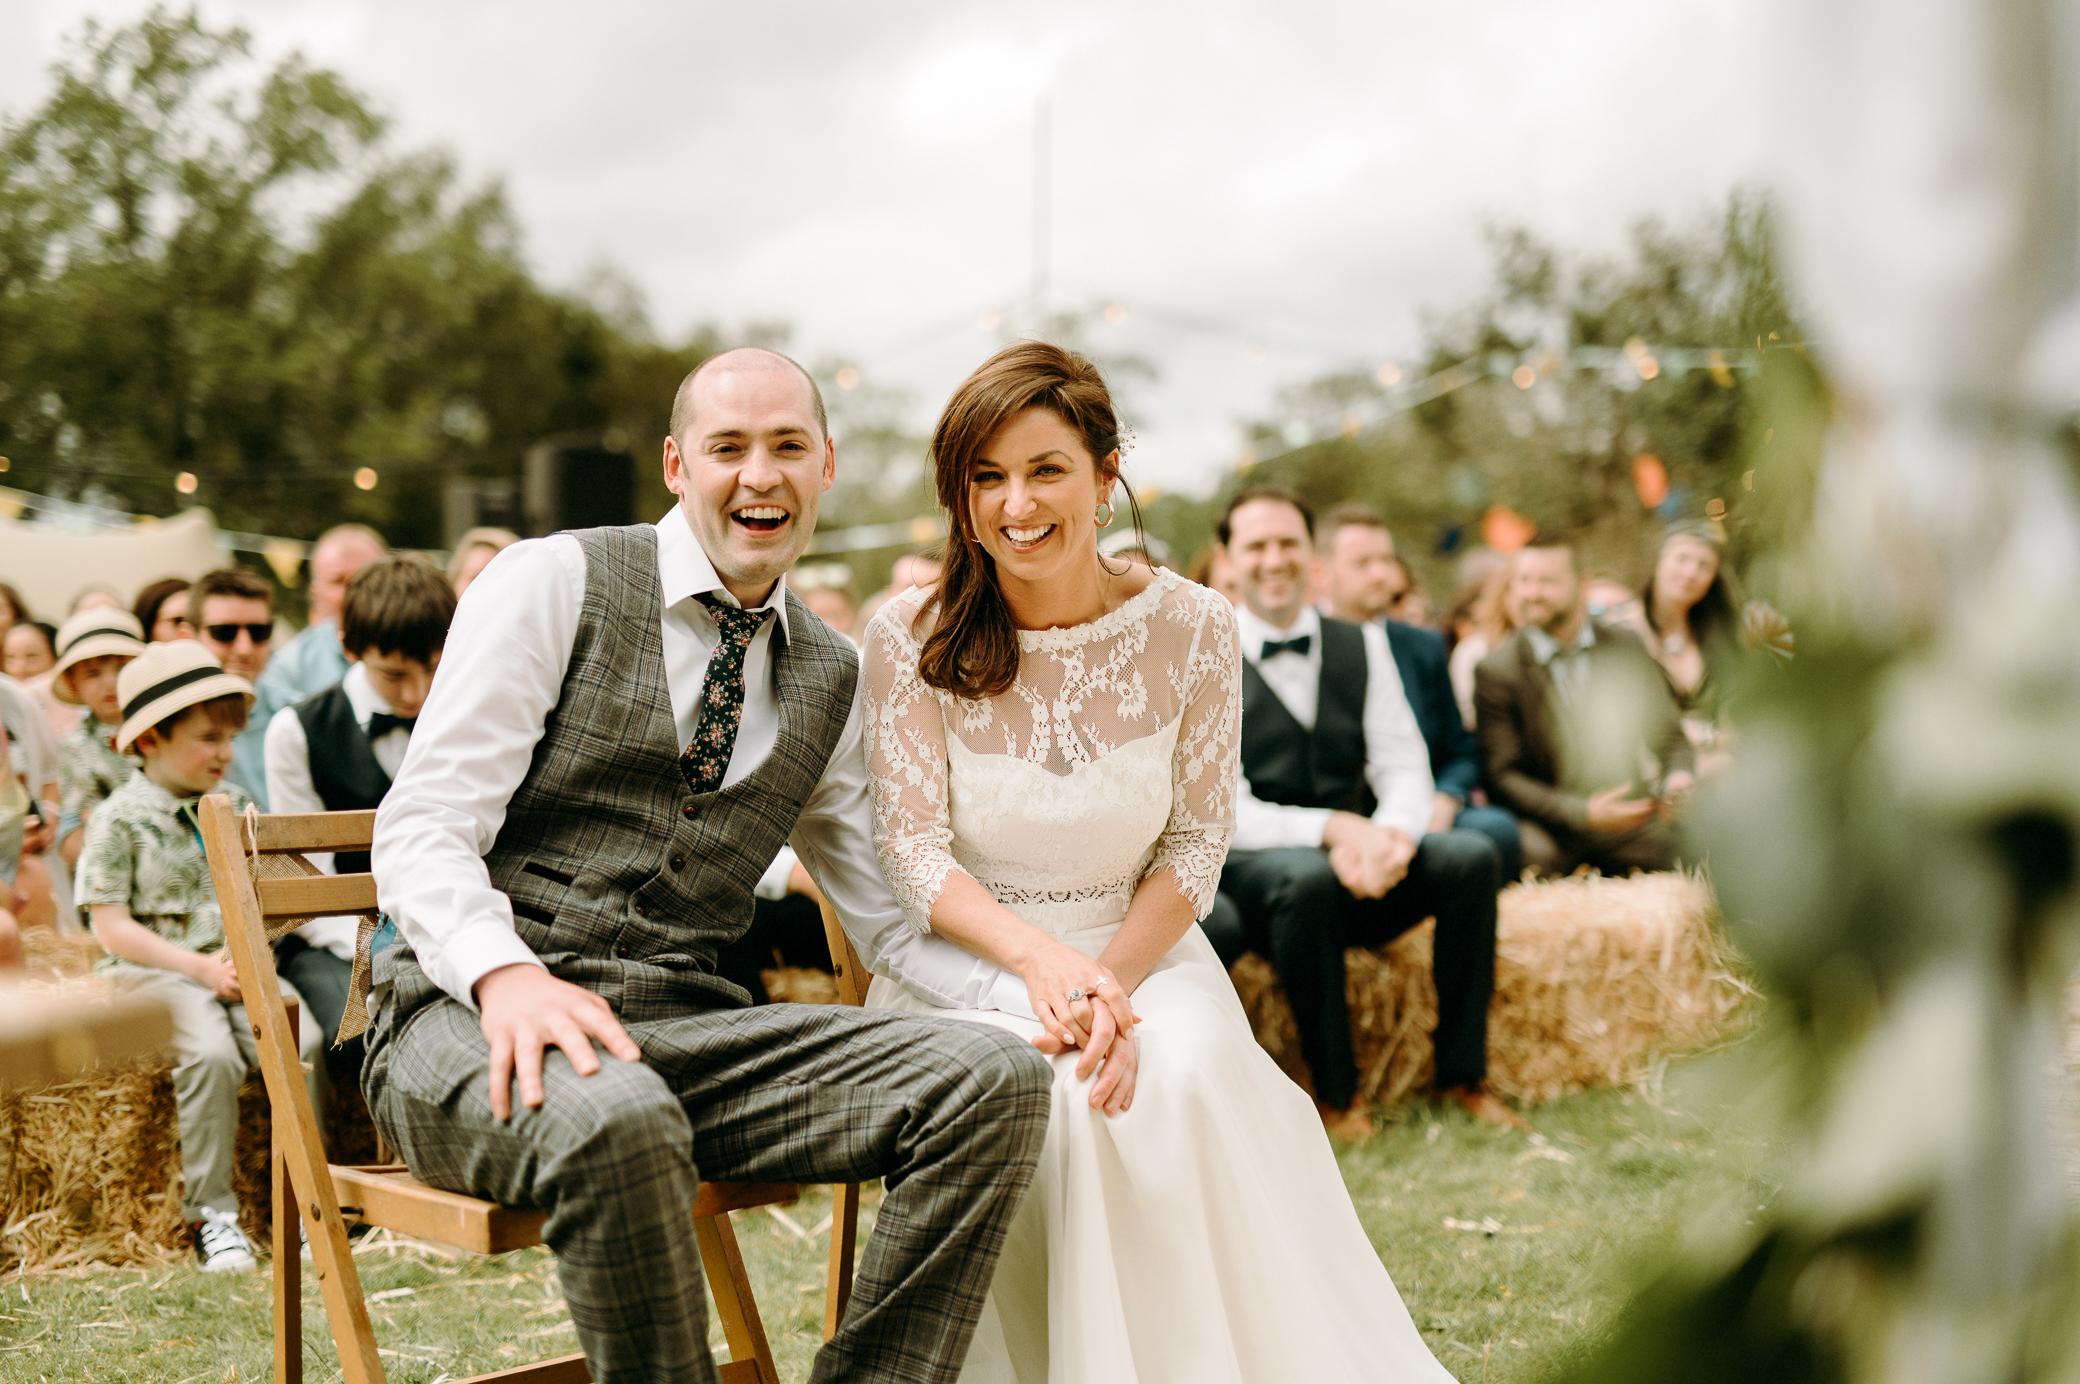 Carmel&Marcus_Wedding photographer Europe-41.jpg